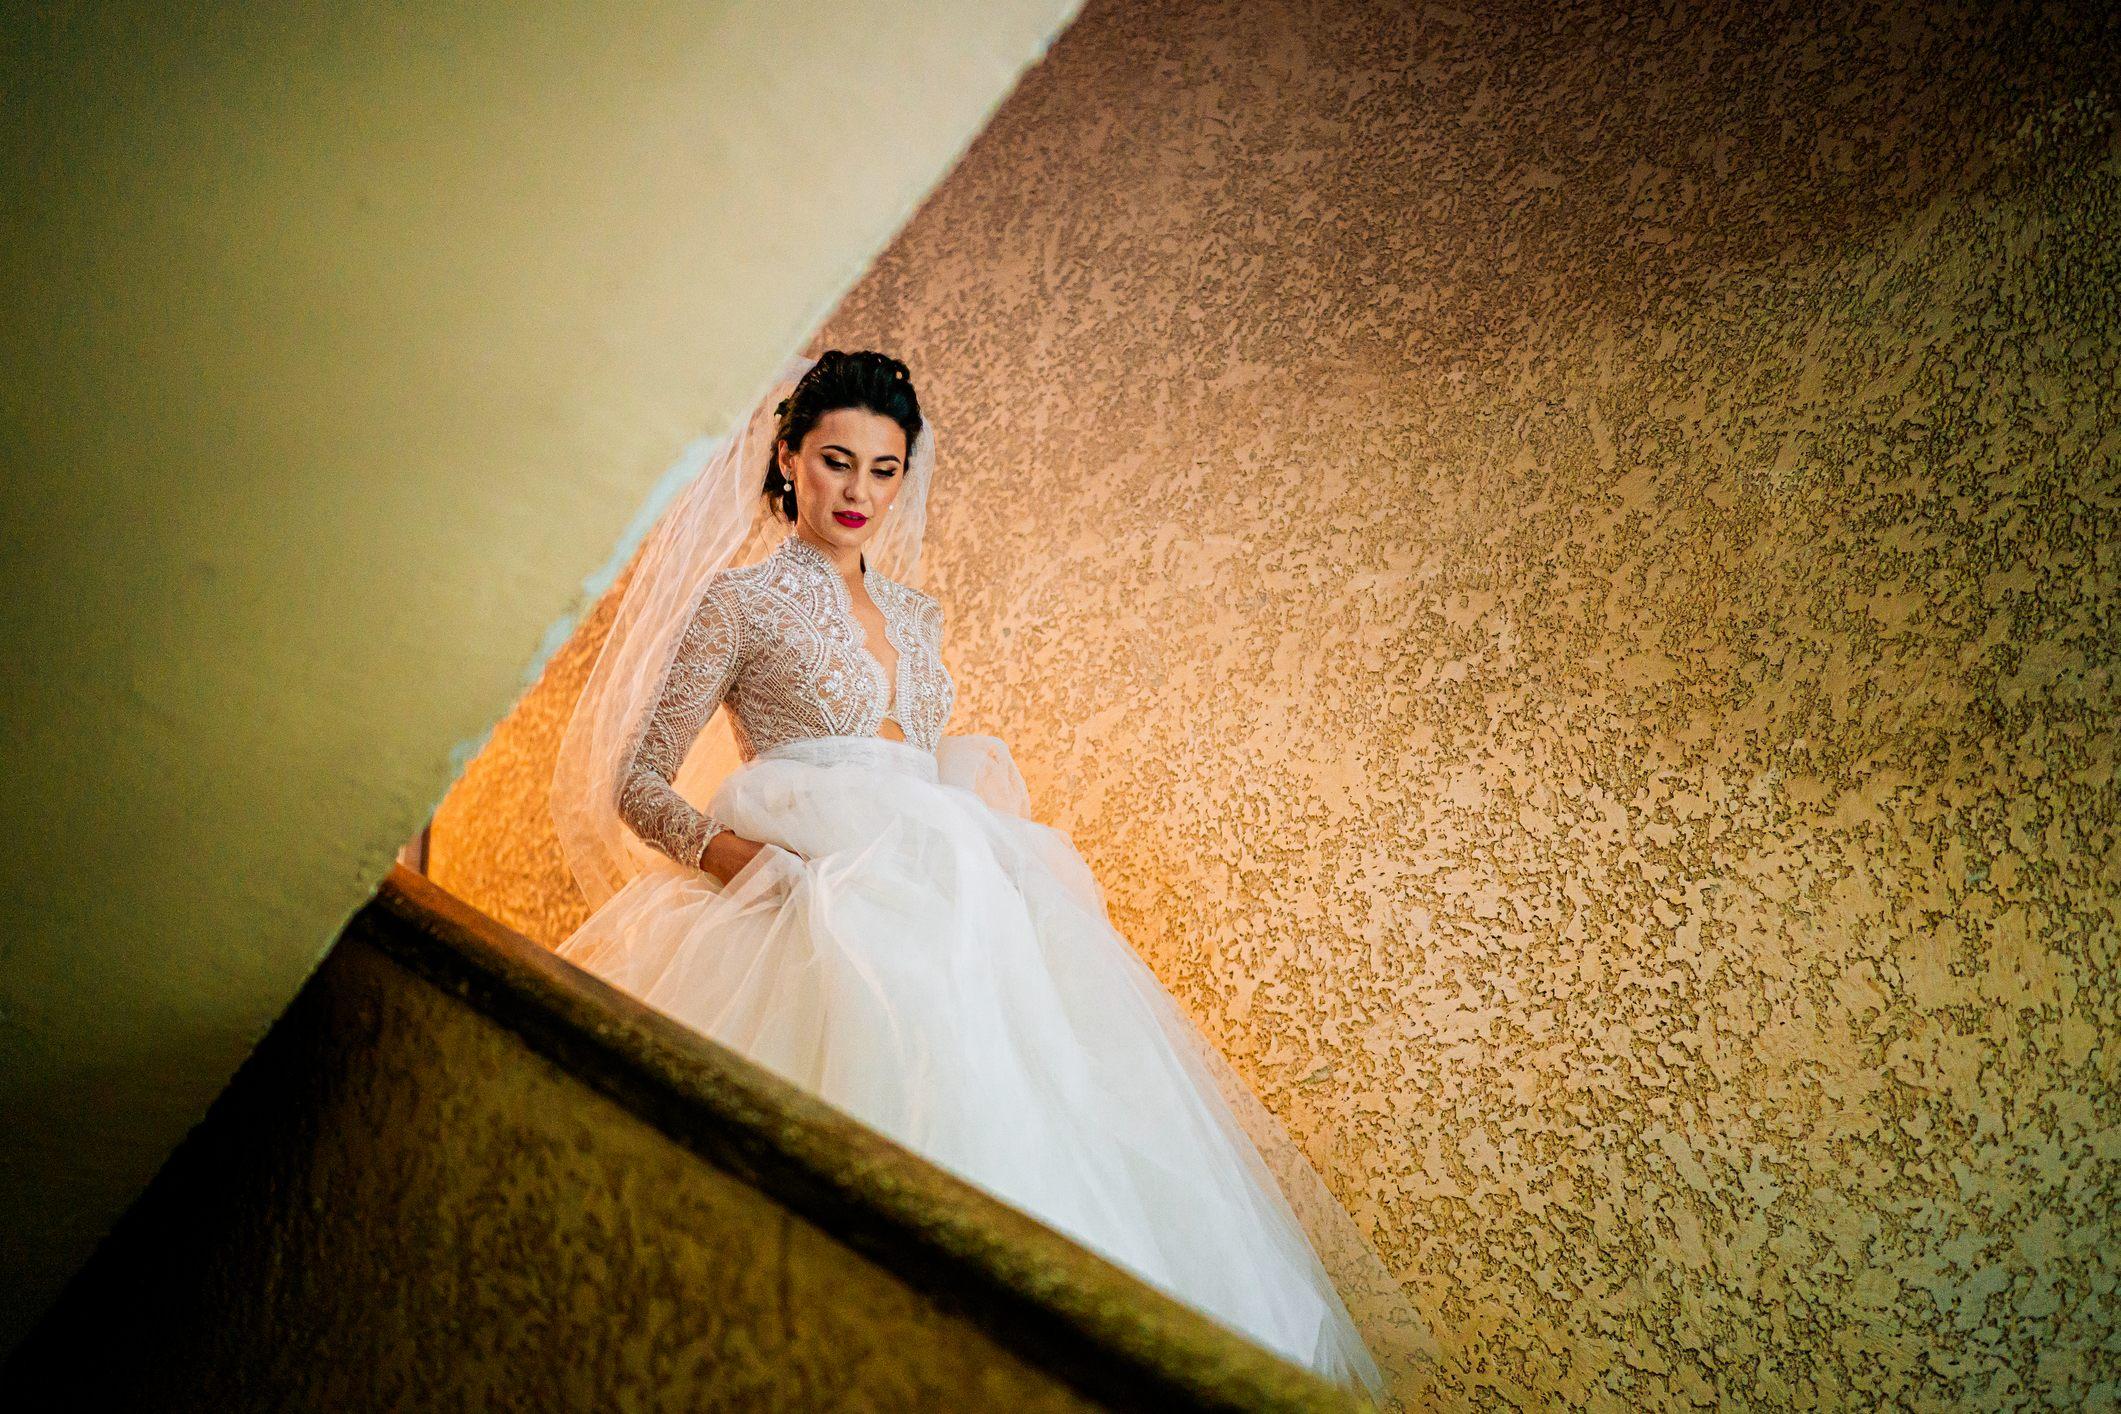 fotograf nunta bucuresti laurentiu nica  5 - Lorena & Matei | Fotografii nunta Bucuresti | Restaurant Domeniul cu Ciresi